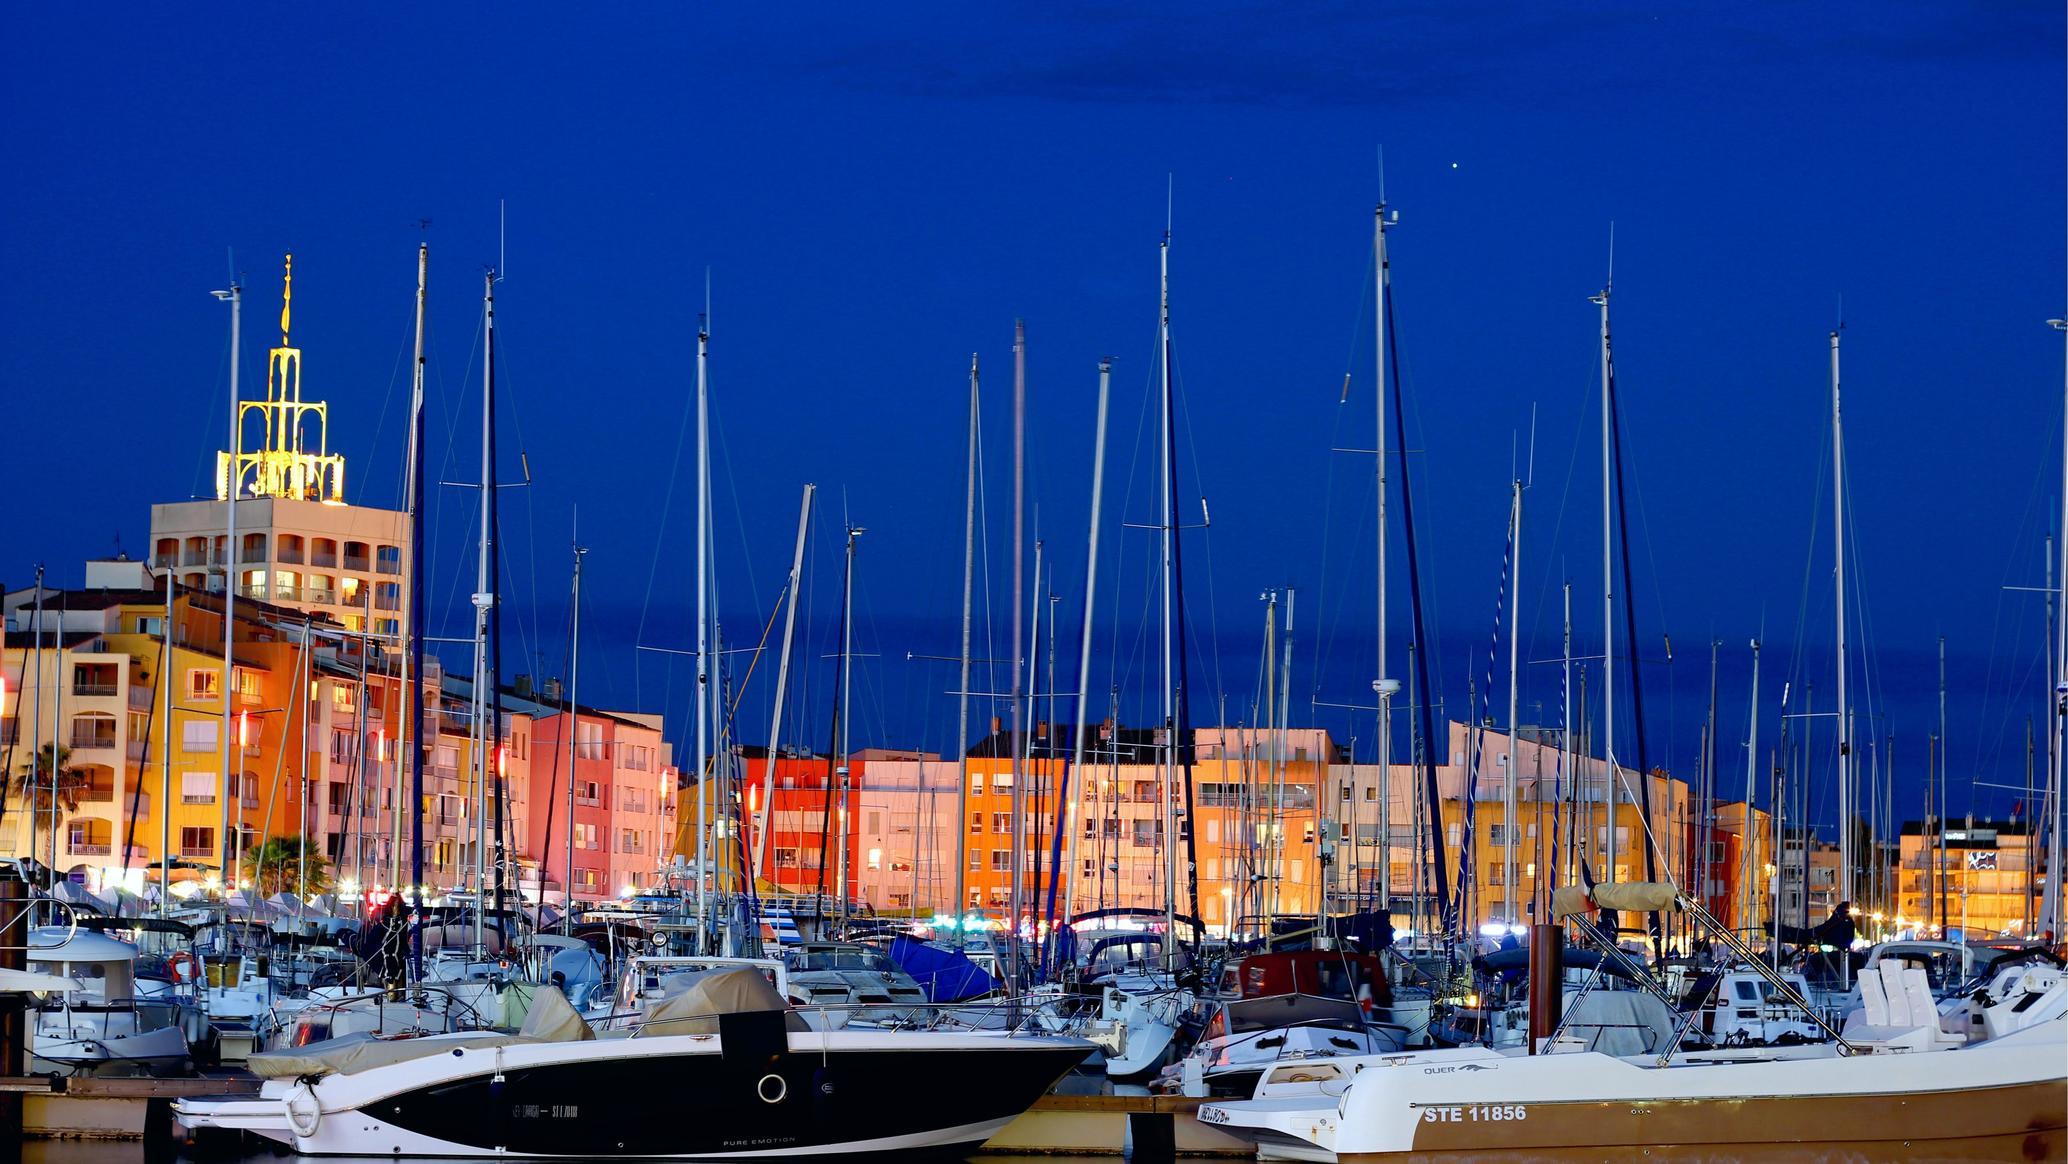 Agde pictures d cap Cap d'Agde: